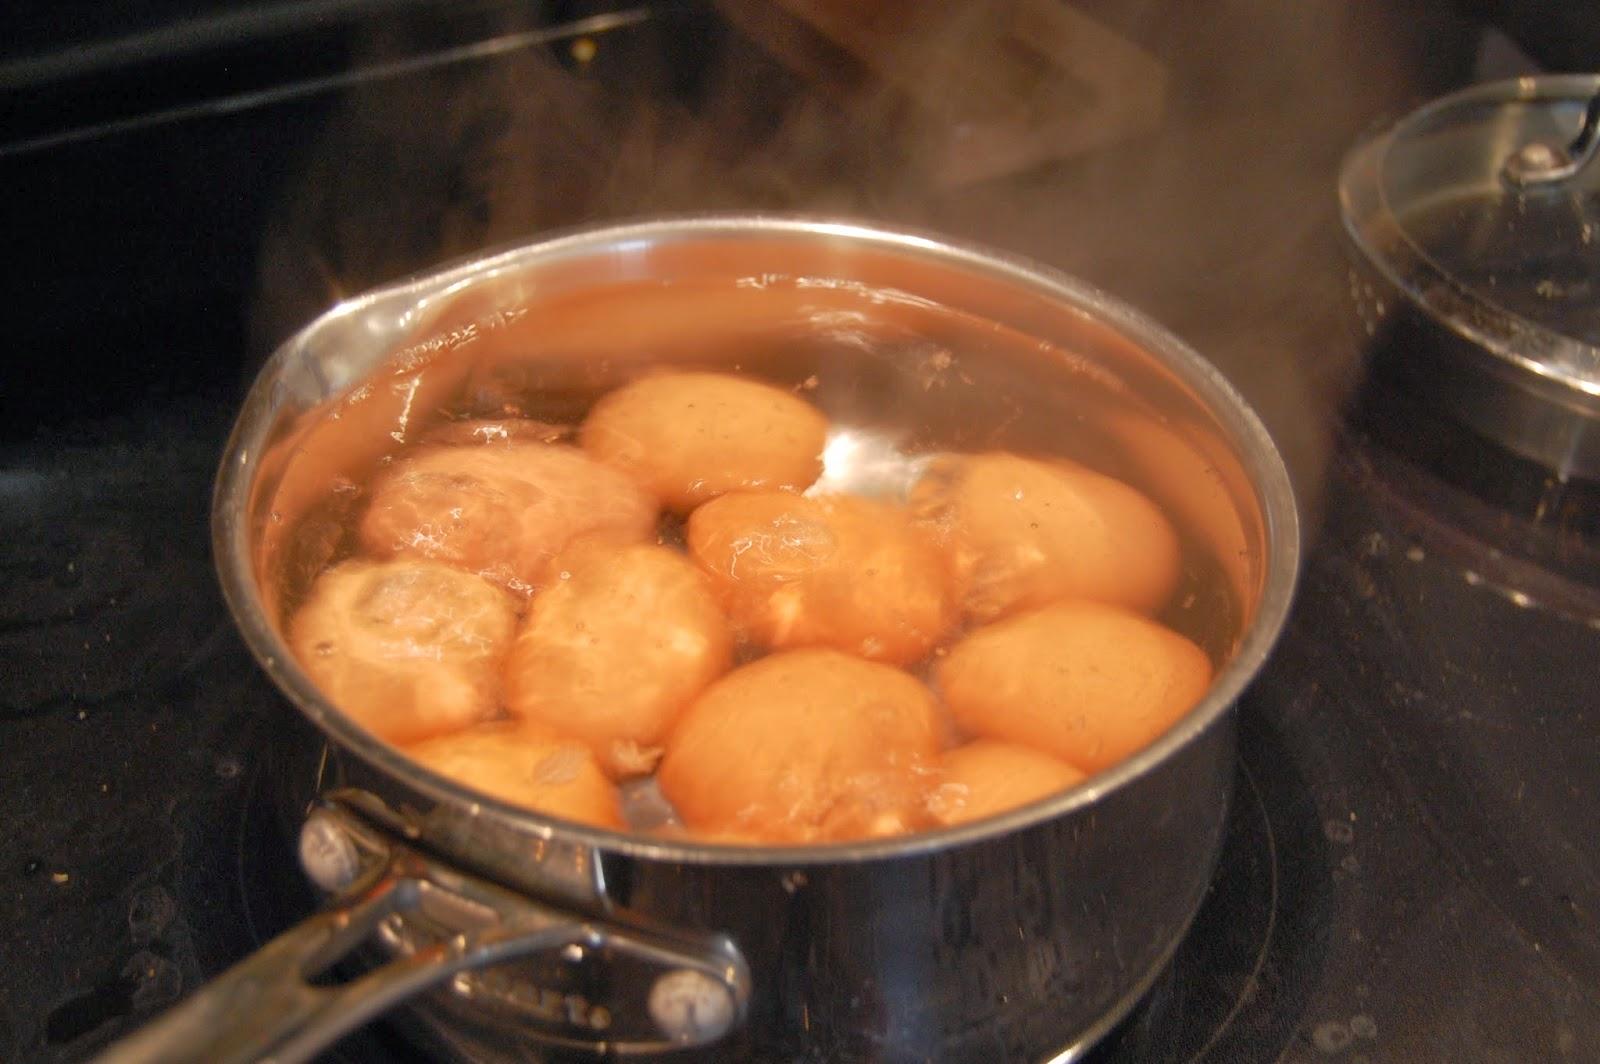 how to make hard boiled eggs runny